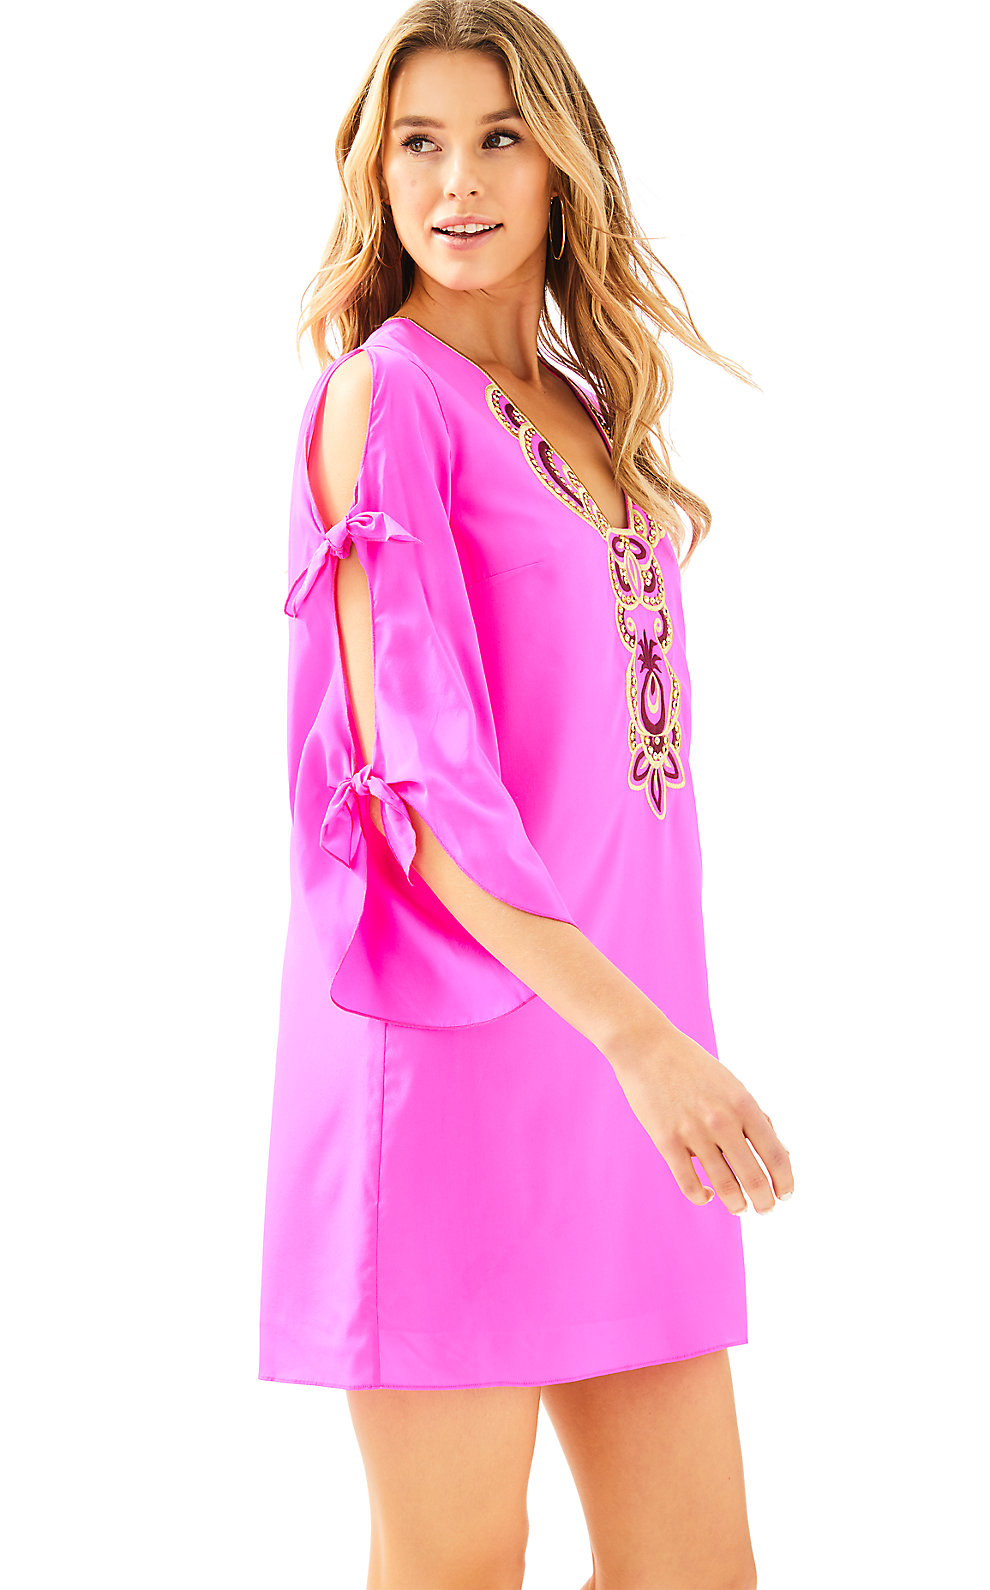 Lilly Pulitzer Avila Stretch Silk Dress